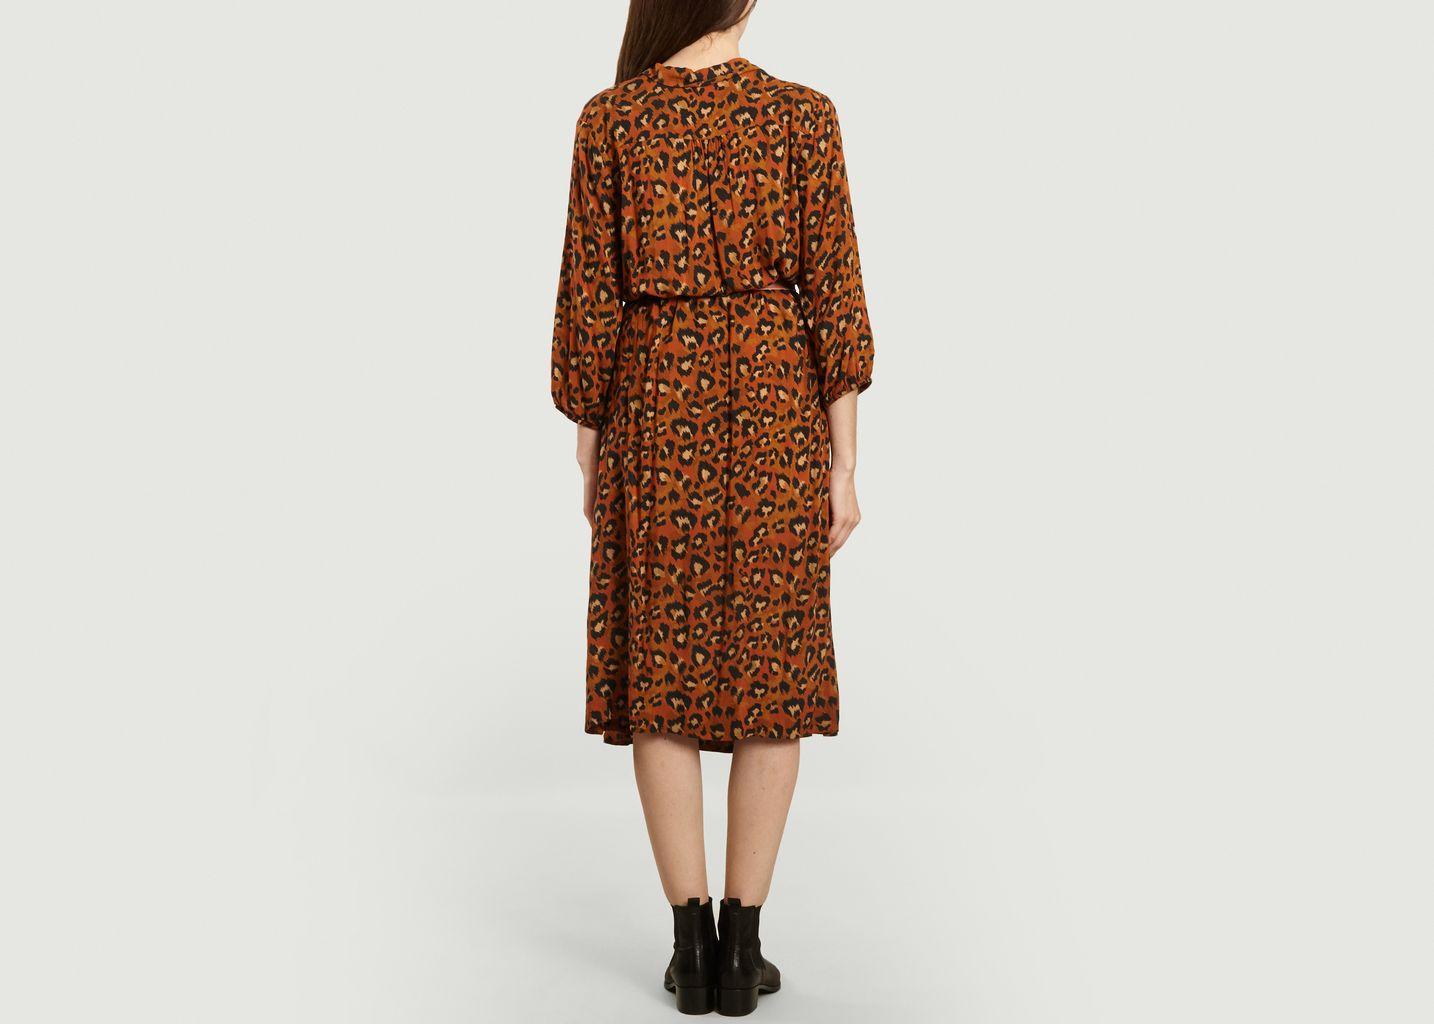 Supermom Damen Dress Ls AOP Brown Leopard Kleid